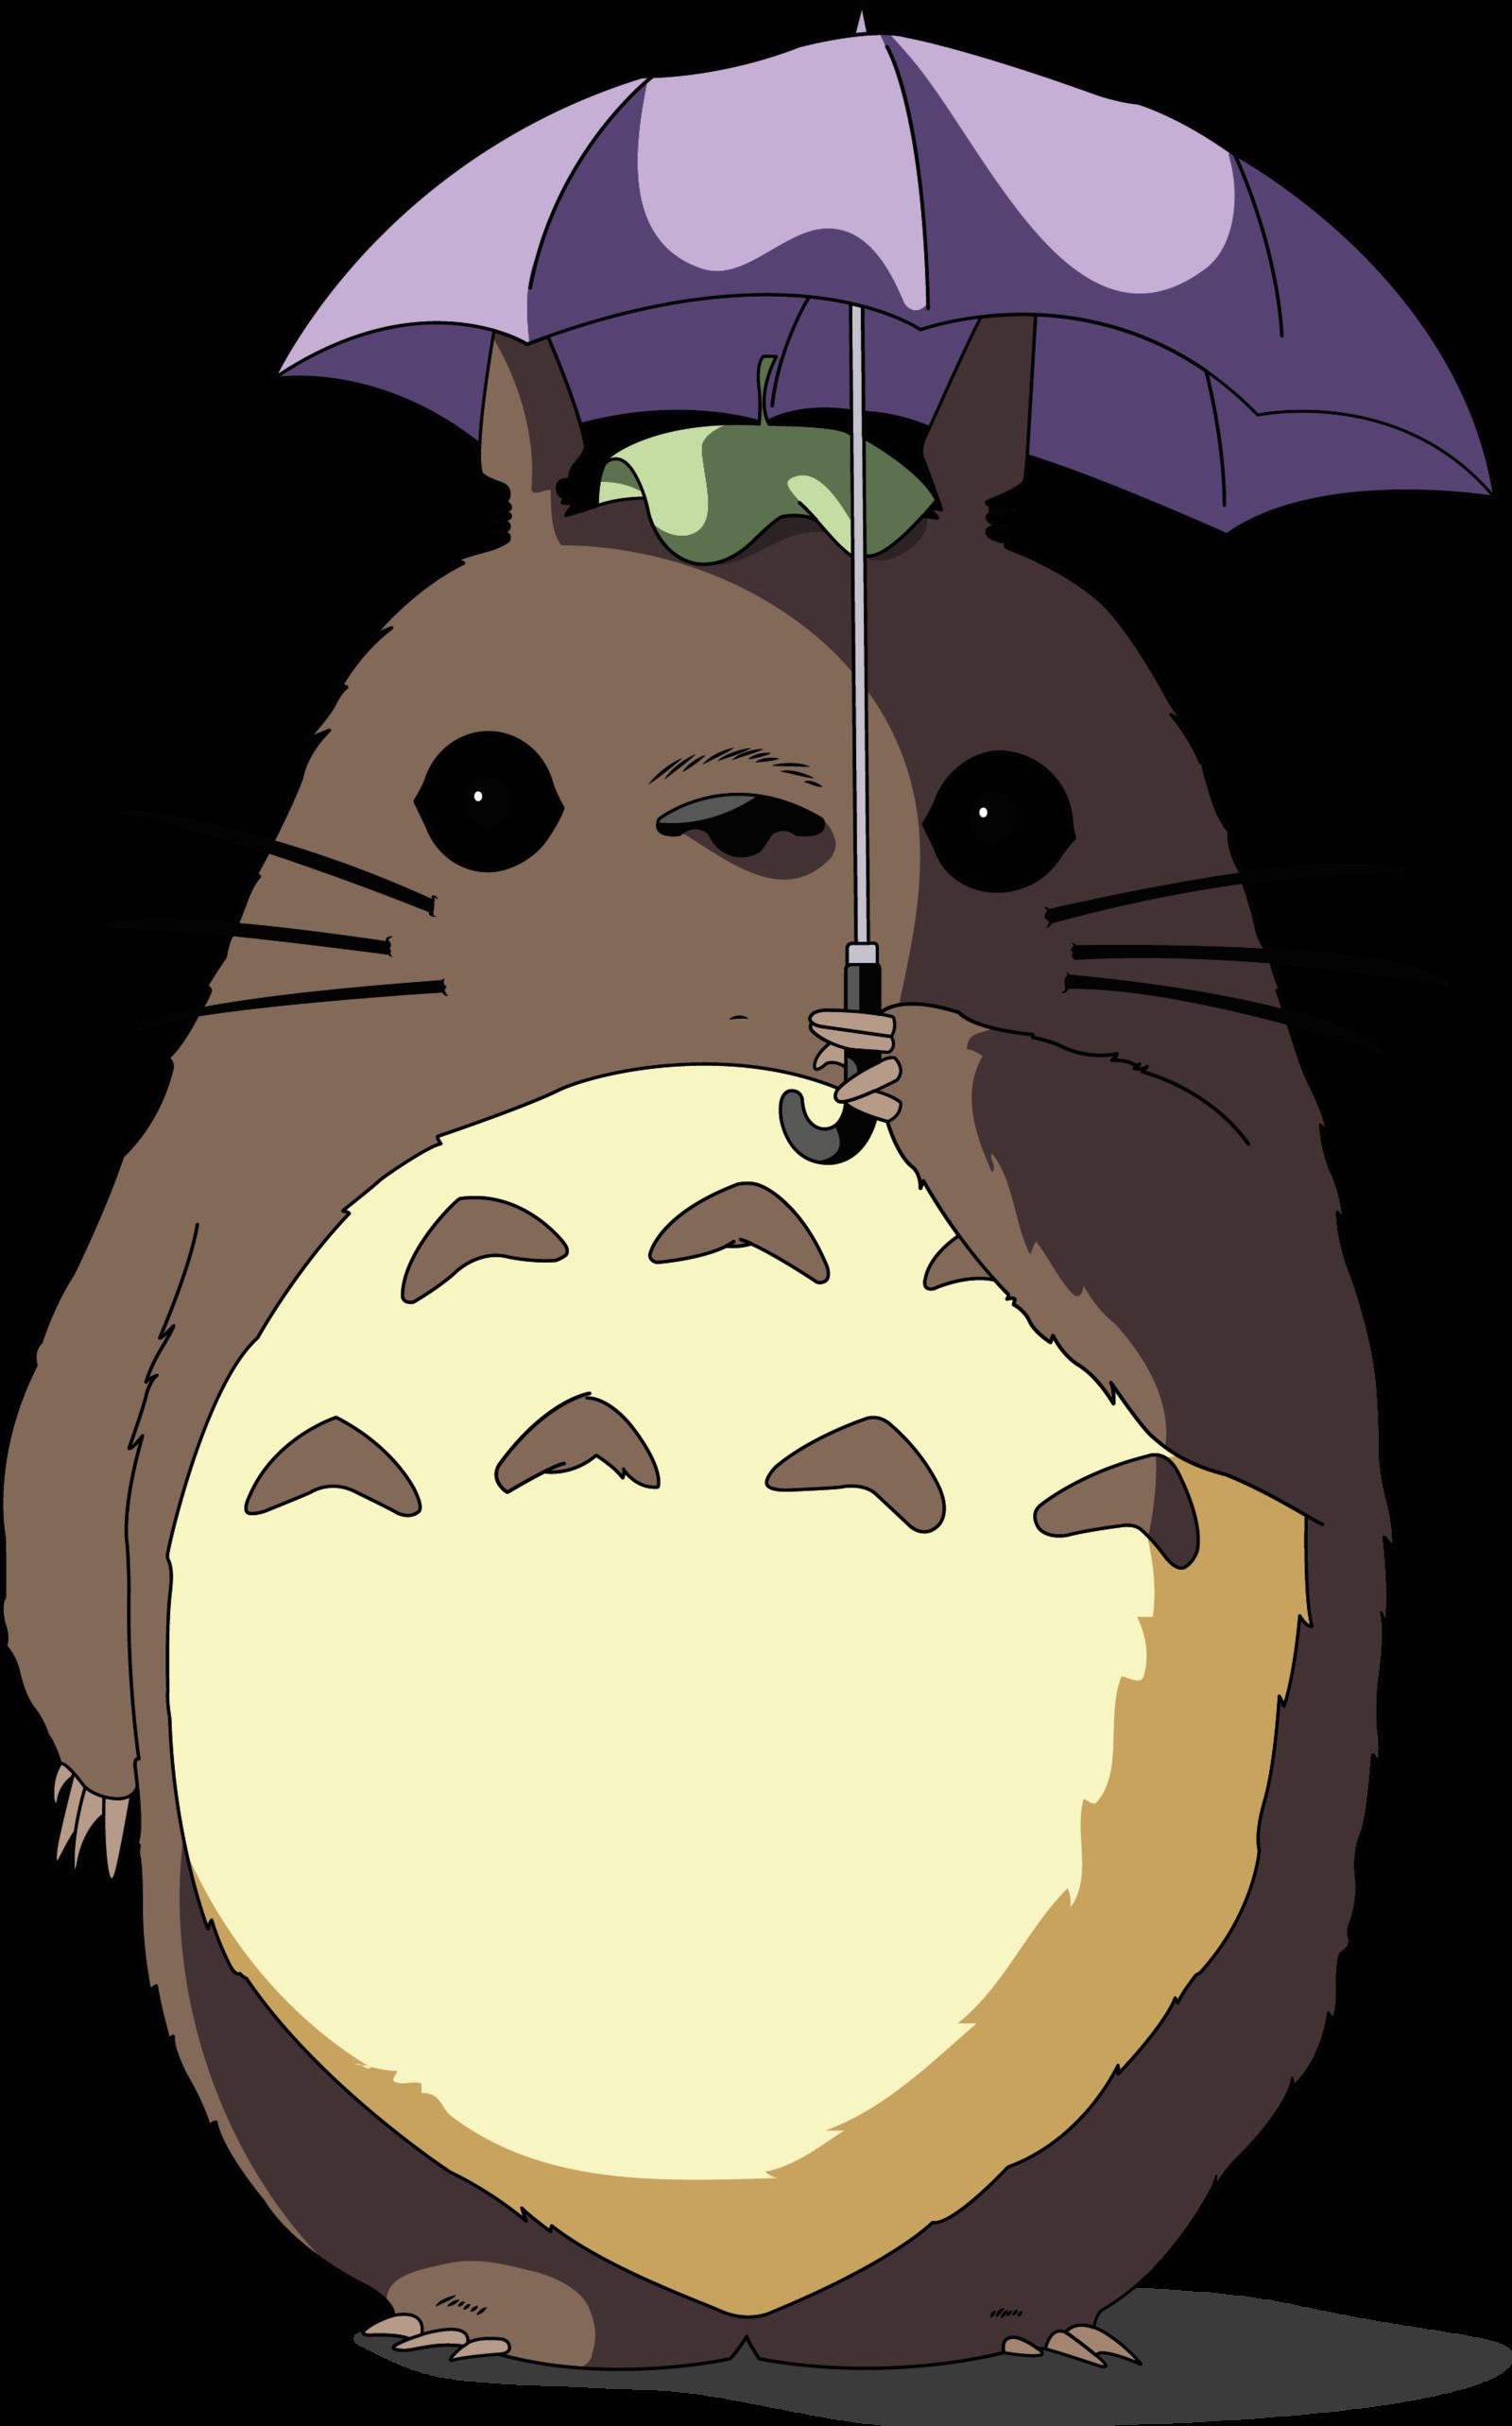 clip art royalty free library Immagine correlata totoro lovins. Drawing running miyazaki